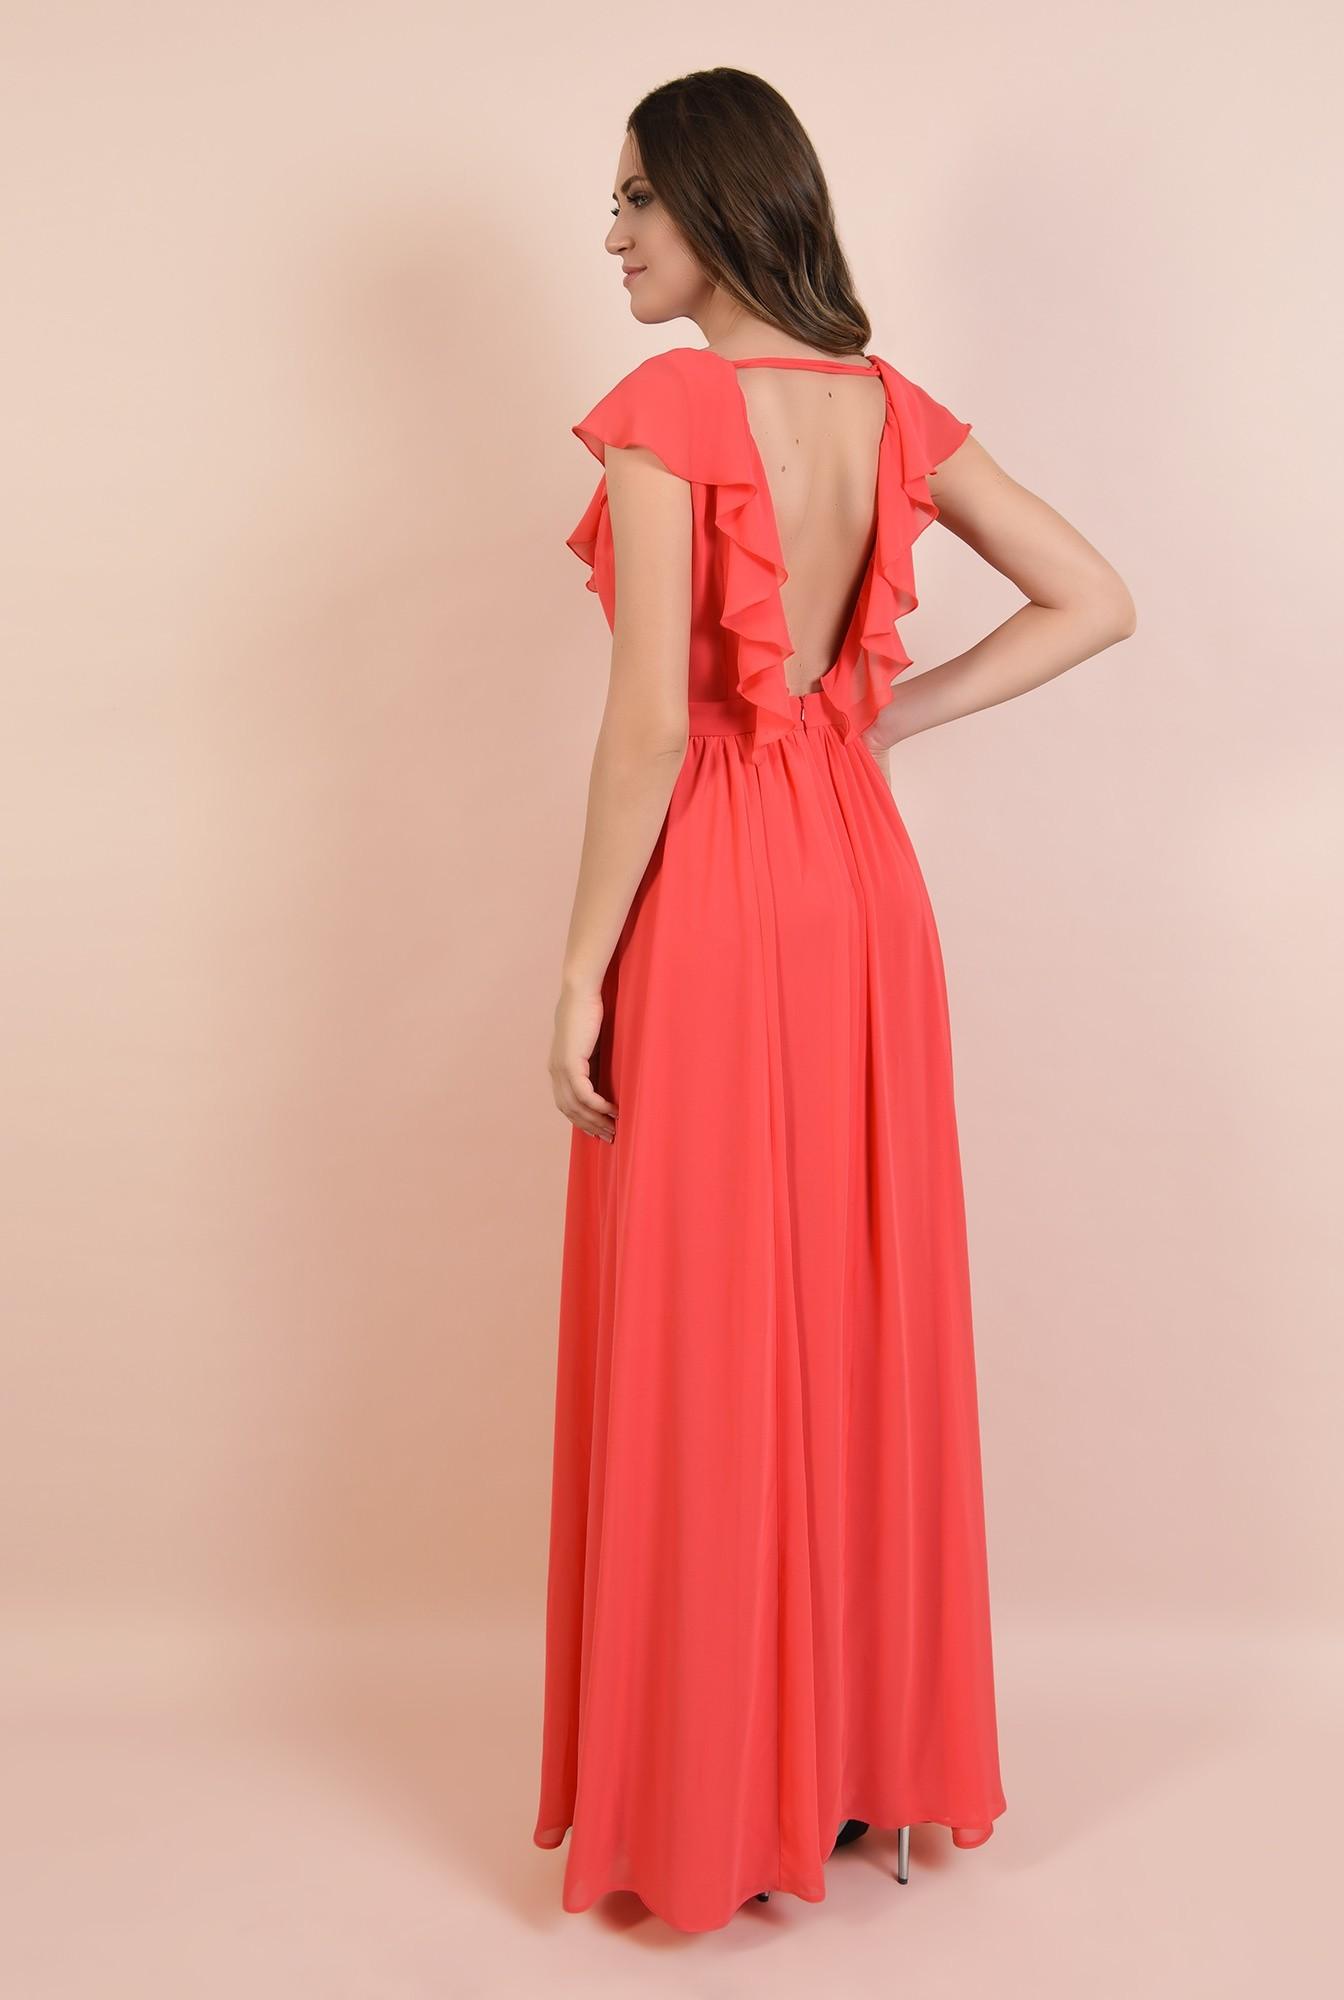 1 - 360 - rochie eleganta, lunga, evazata, cu anchior, cu volane, Poema